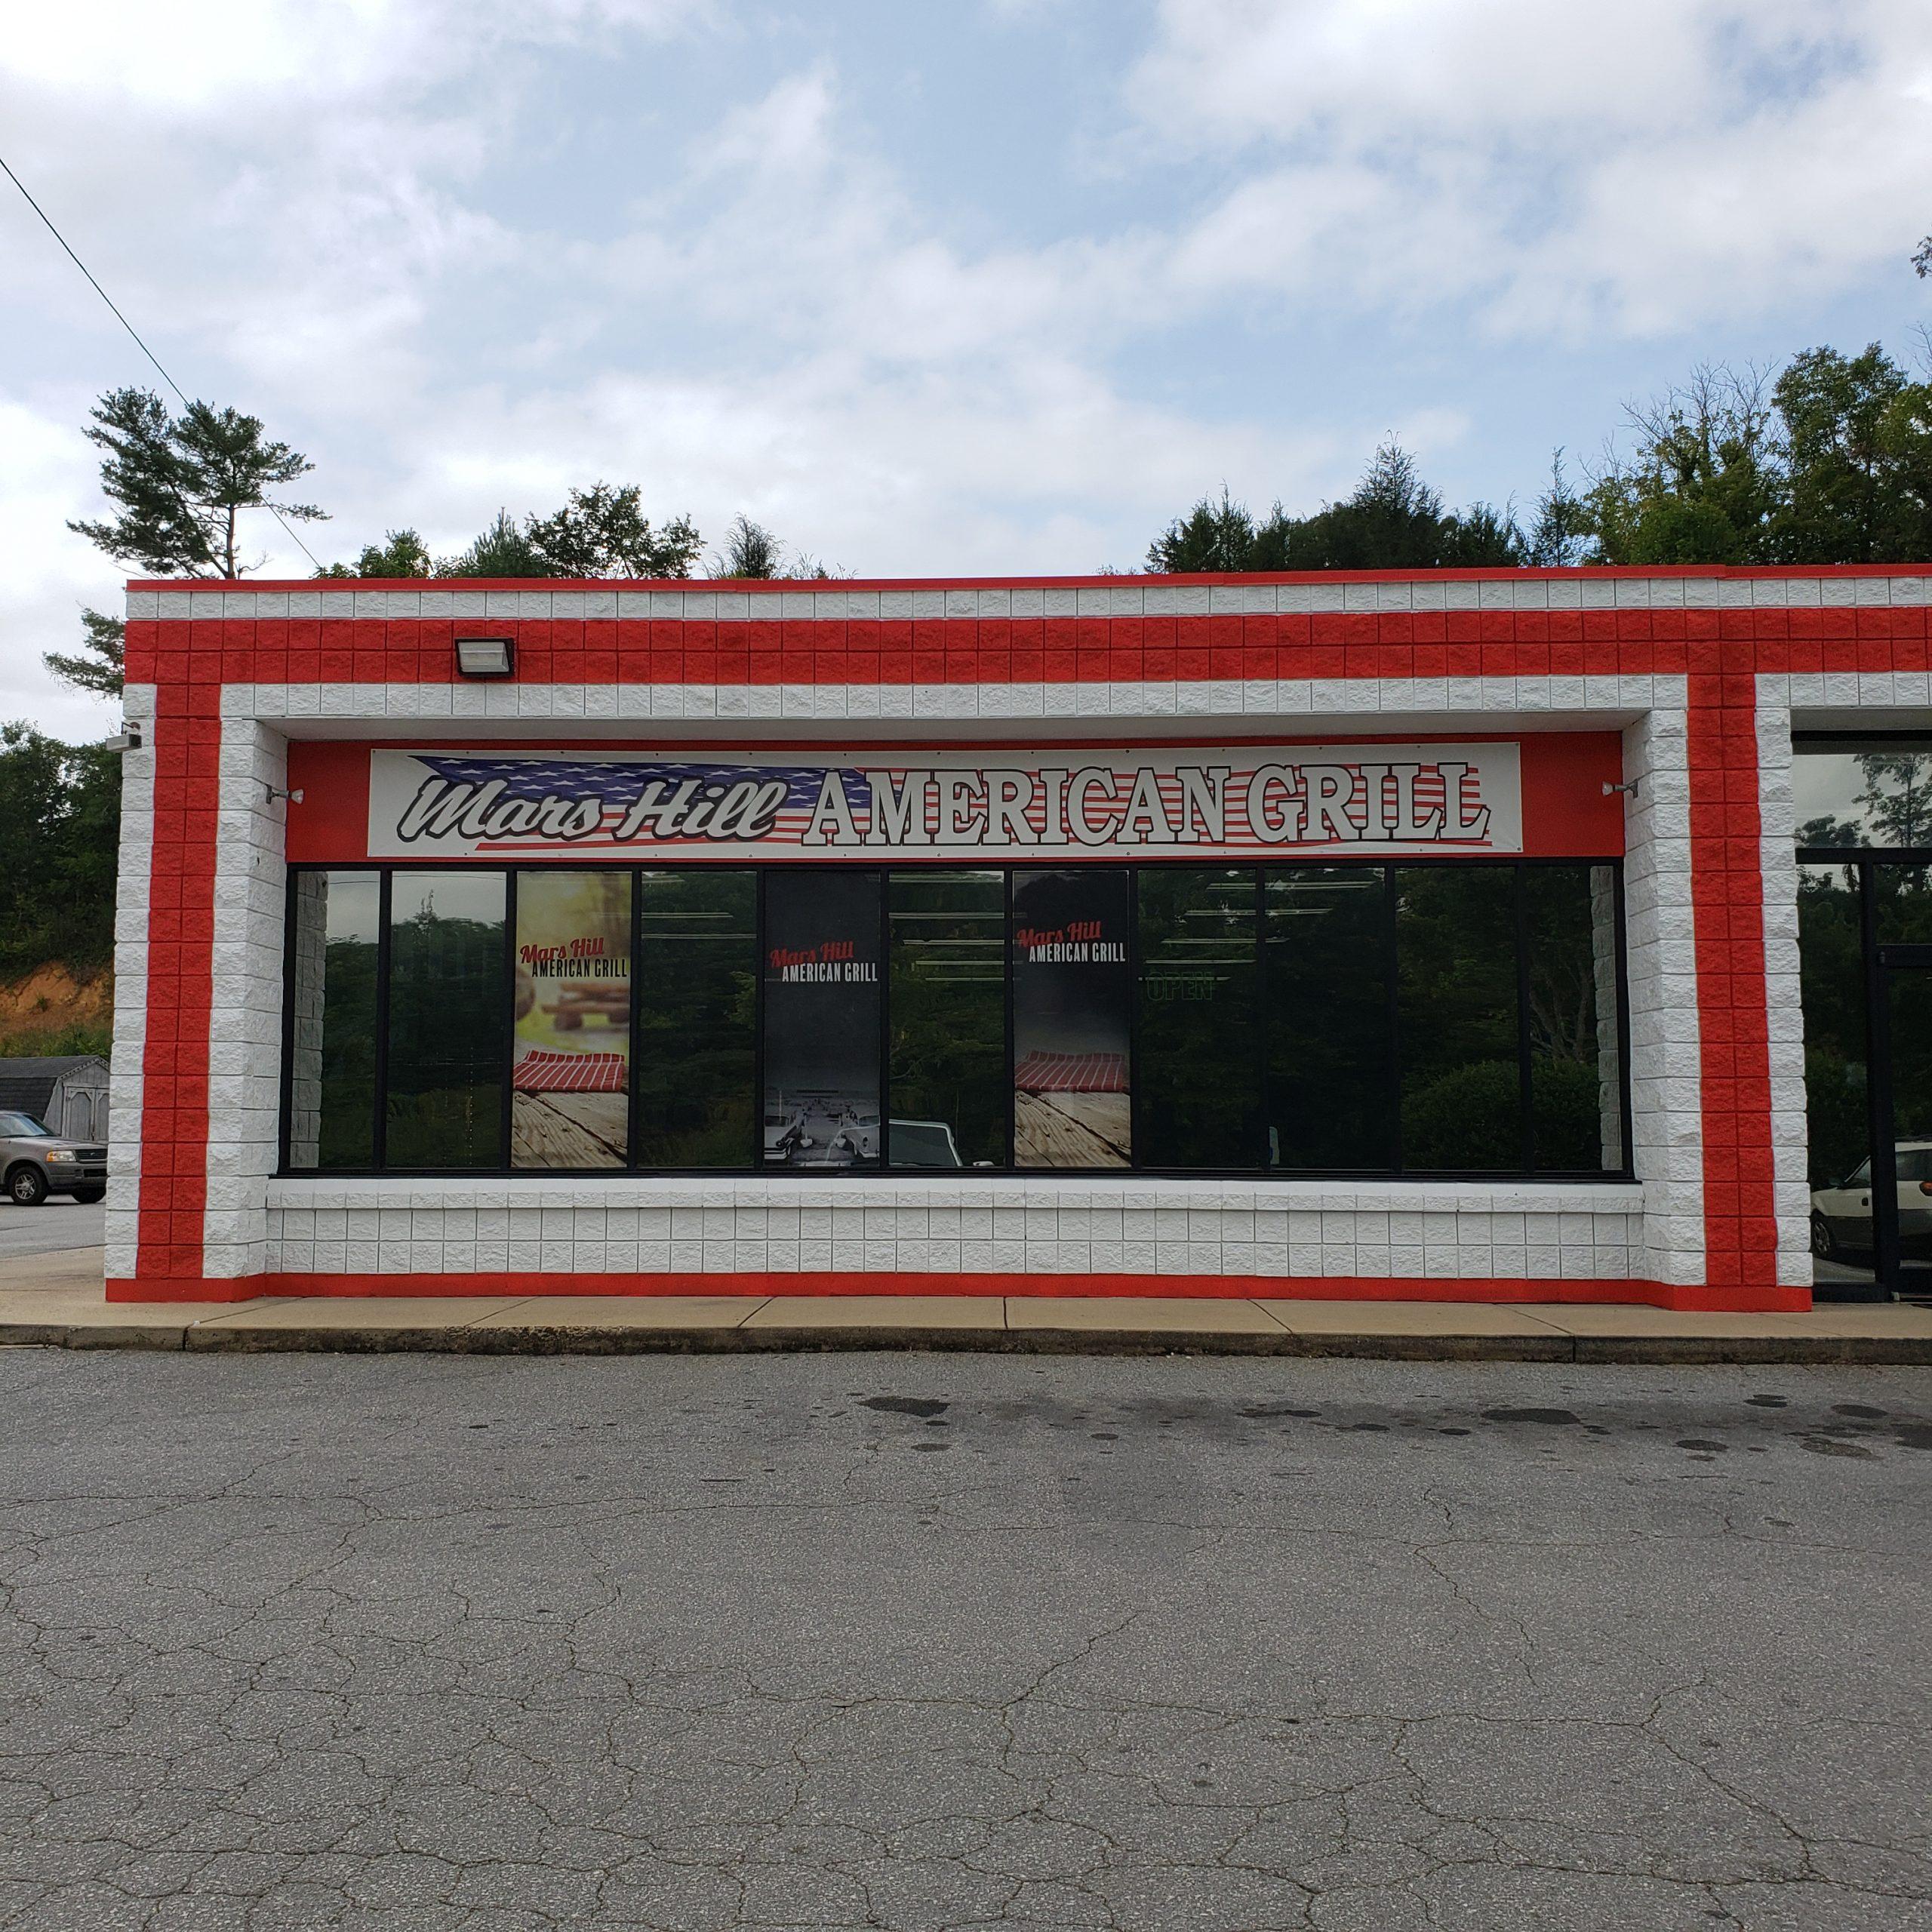 Restaurants in Mars Hill NC